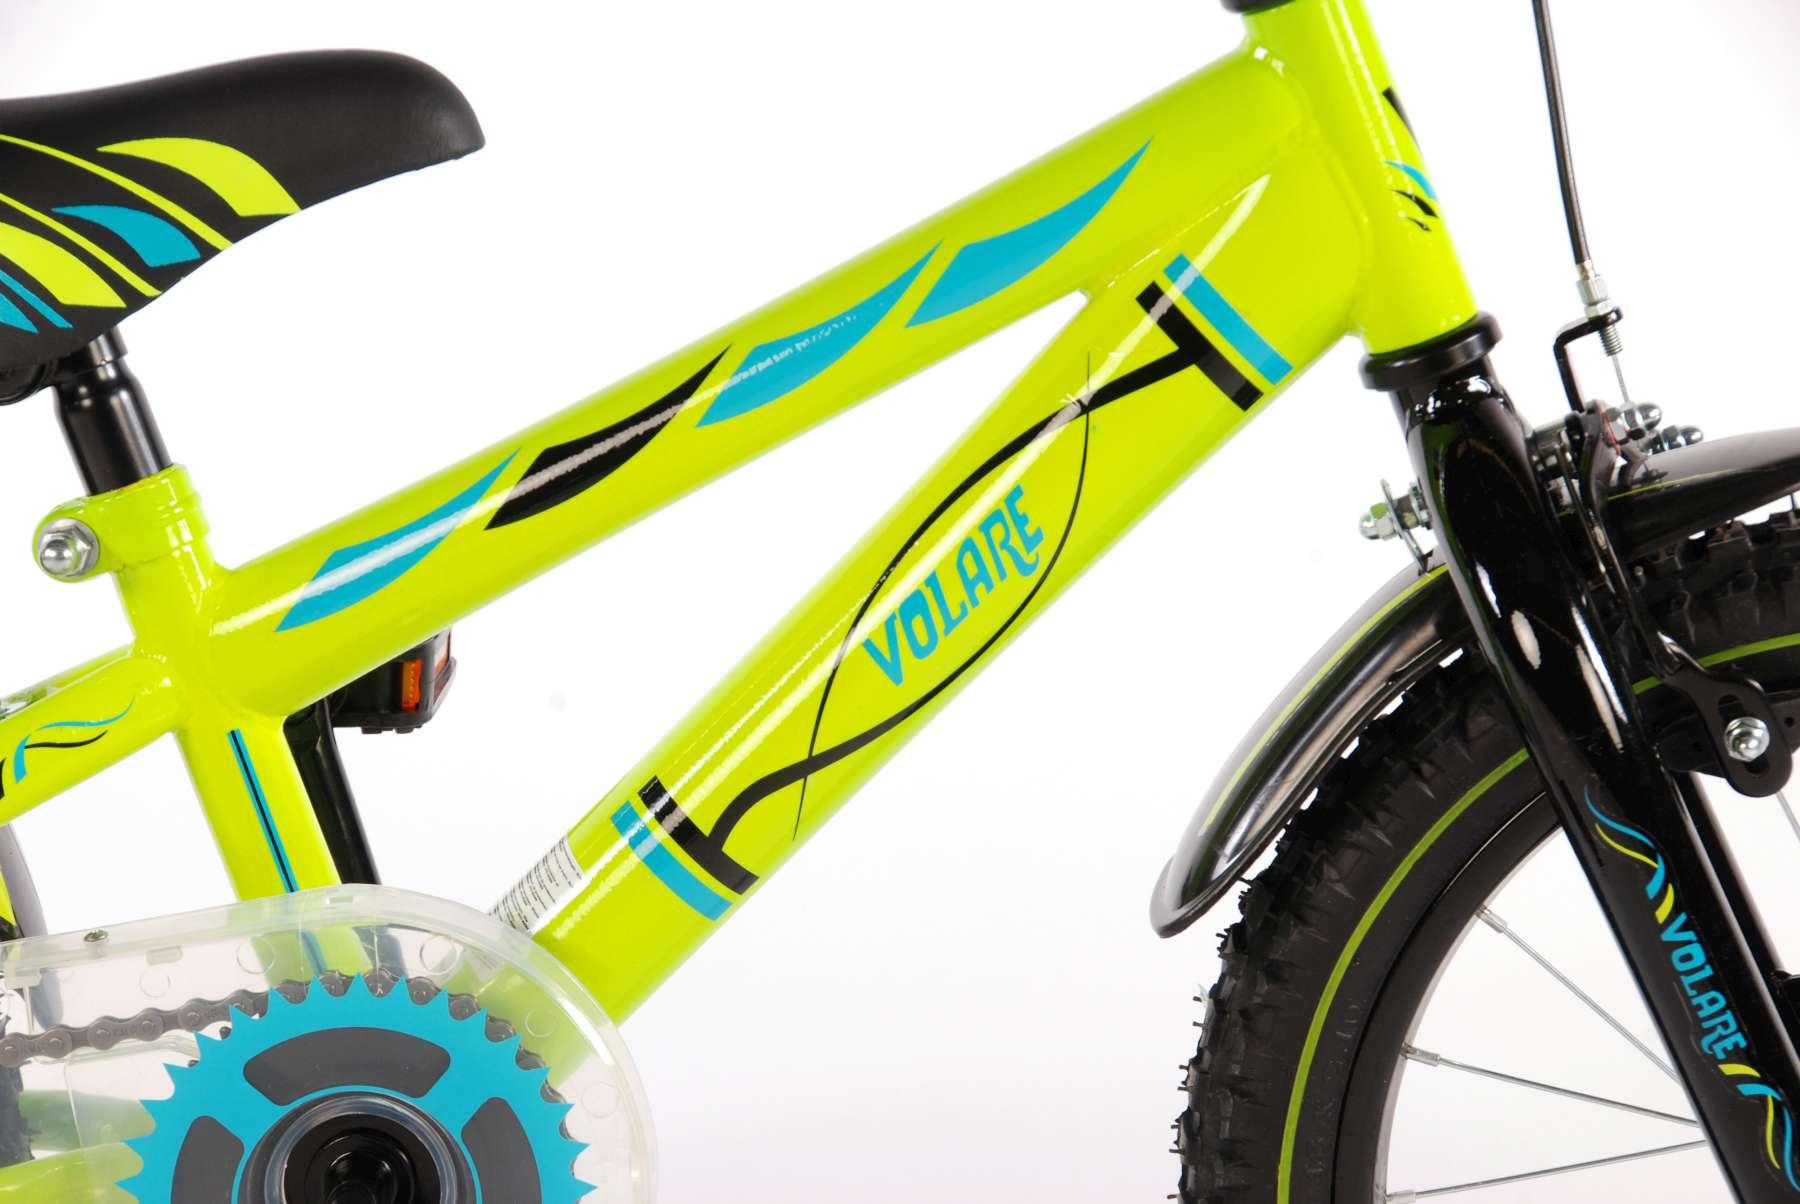 Bicicleta Volare Verde electrica 16 pulgadas